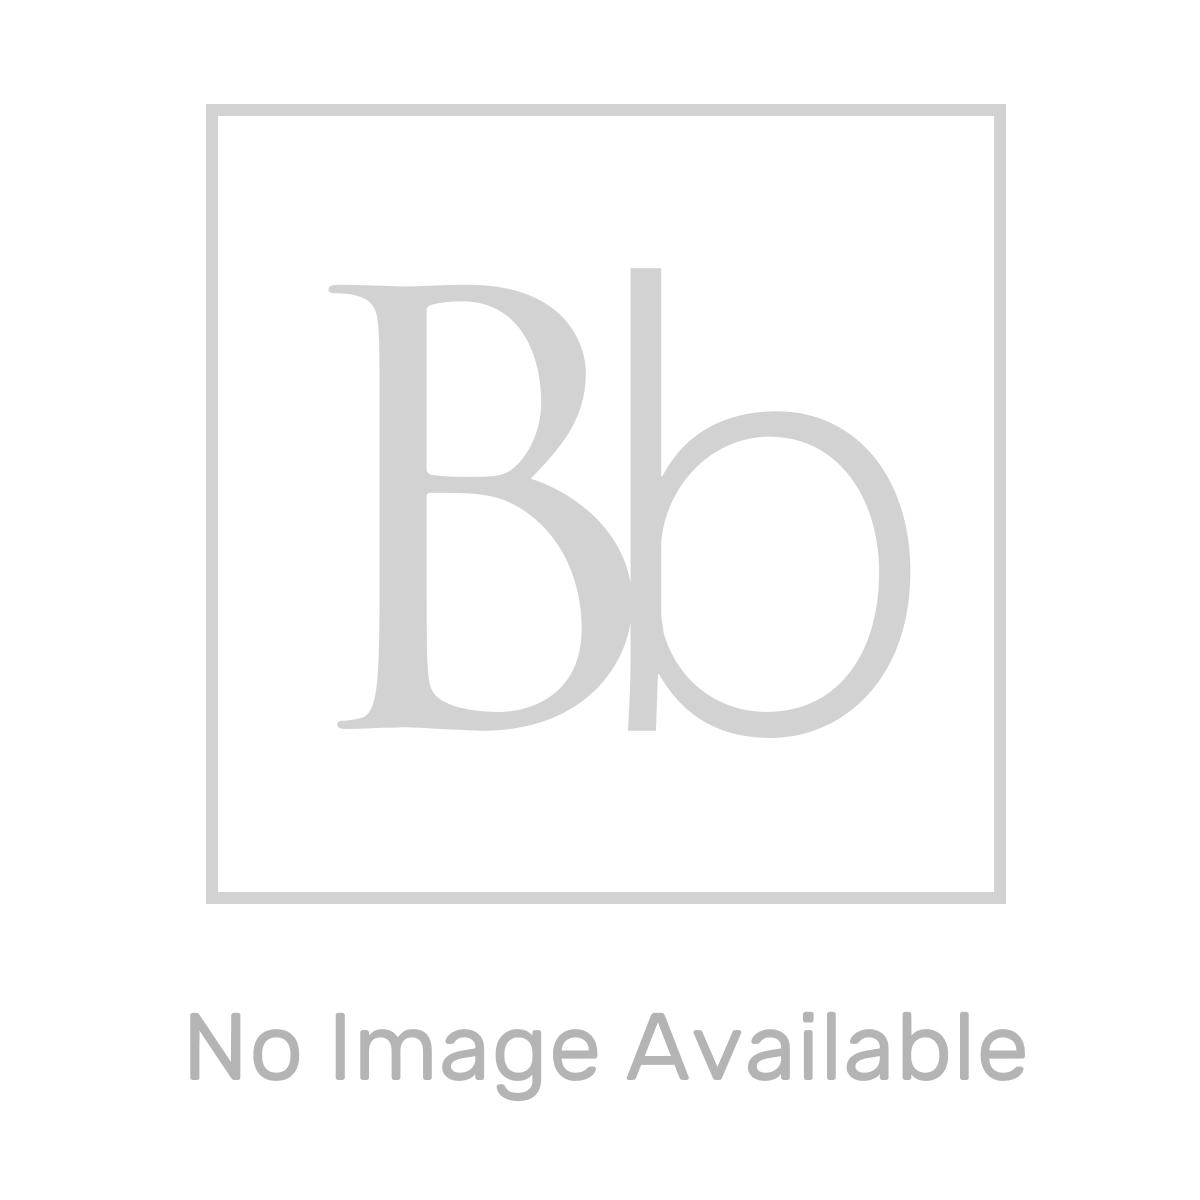 Frontline Tudor White Bath End Panel 700mm